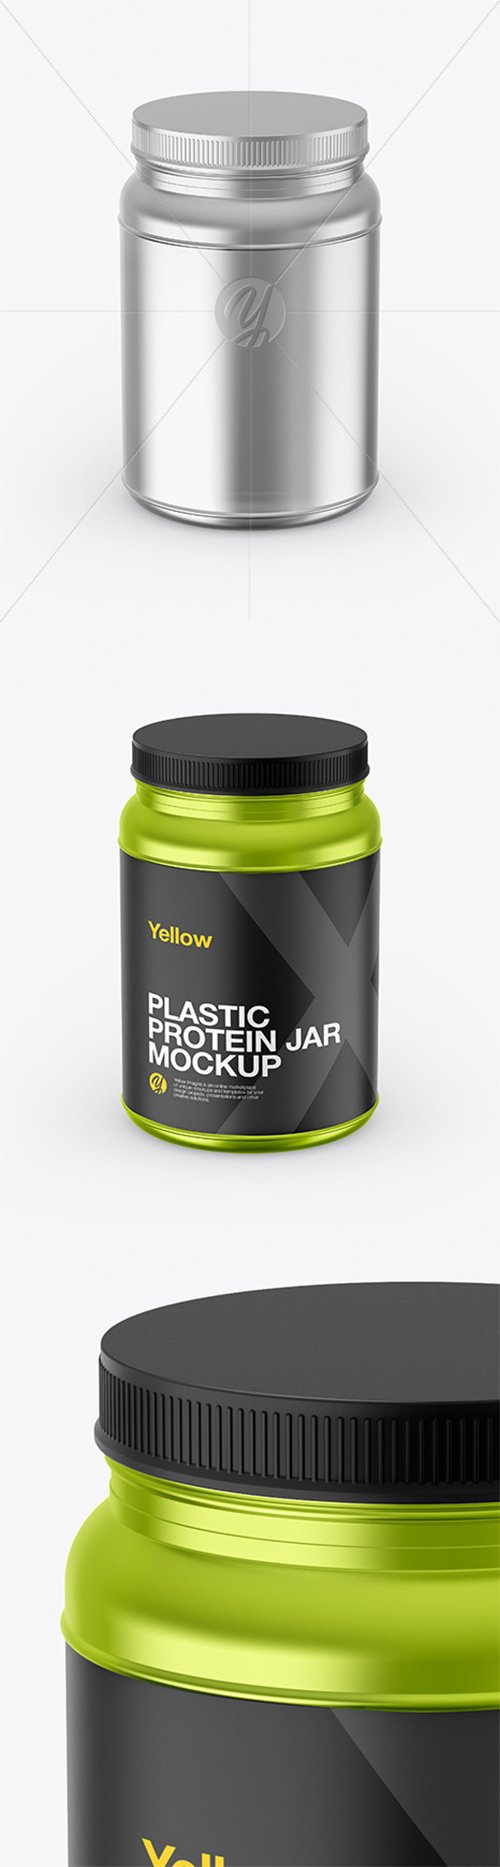 Metallized Protein Jar Mockup 65433